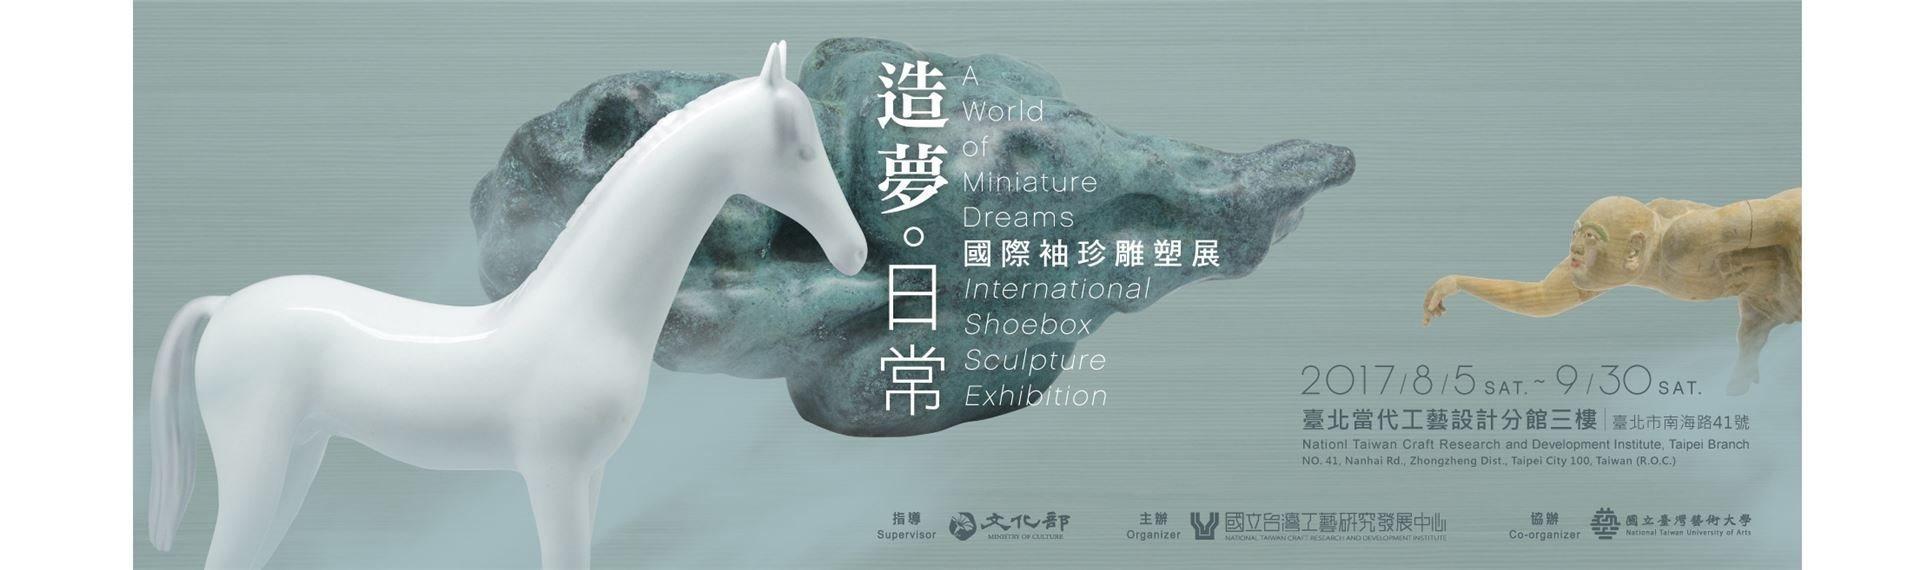 A World of Miniature Dreams -International Shoebox Sculpture Exhibition